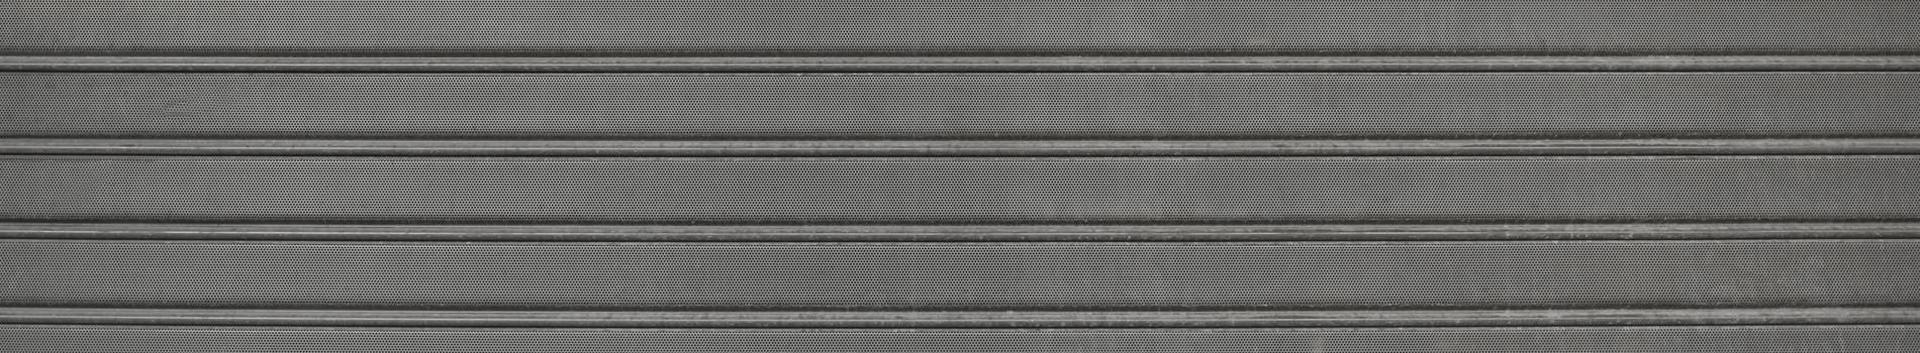 25611_metallitootlus_65600046_xl.jpg